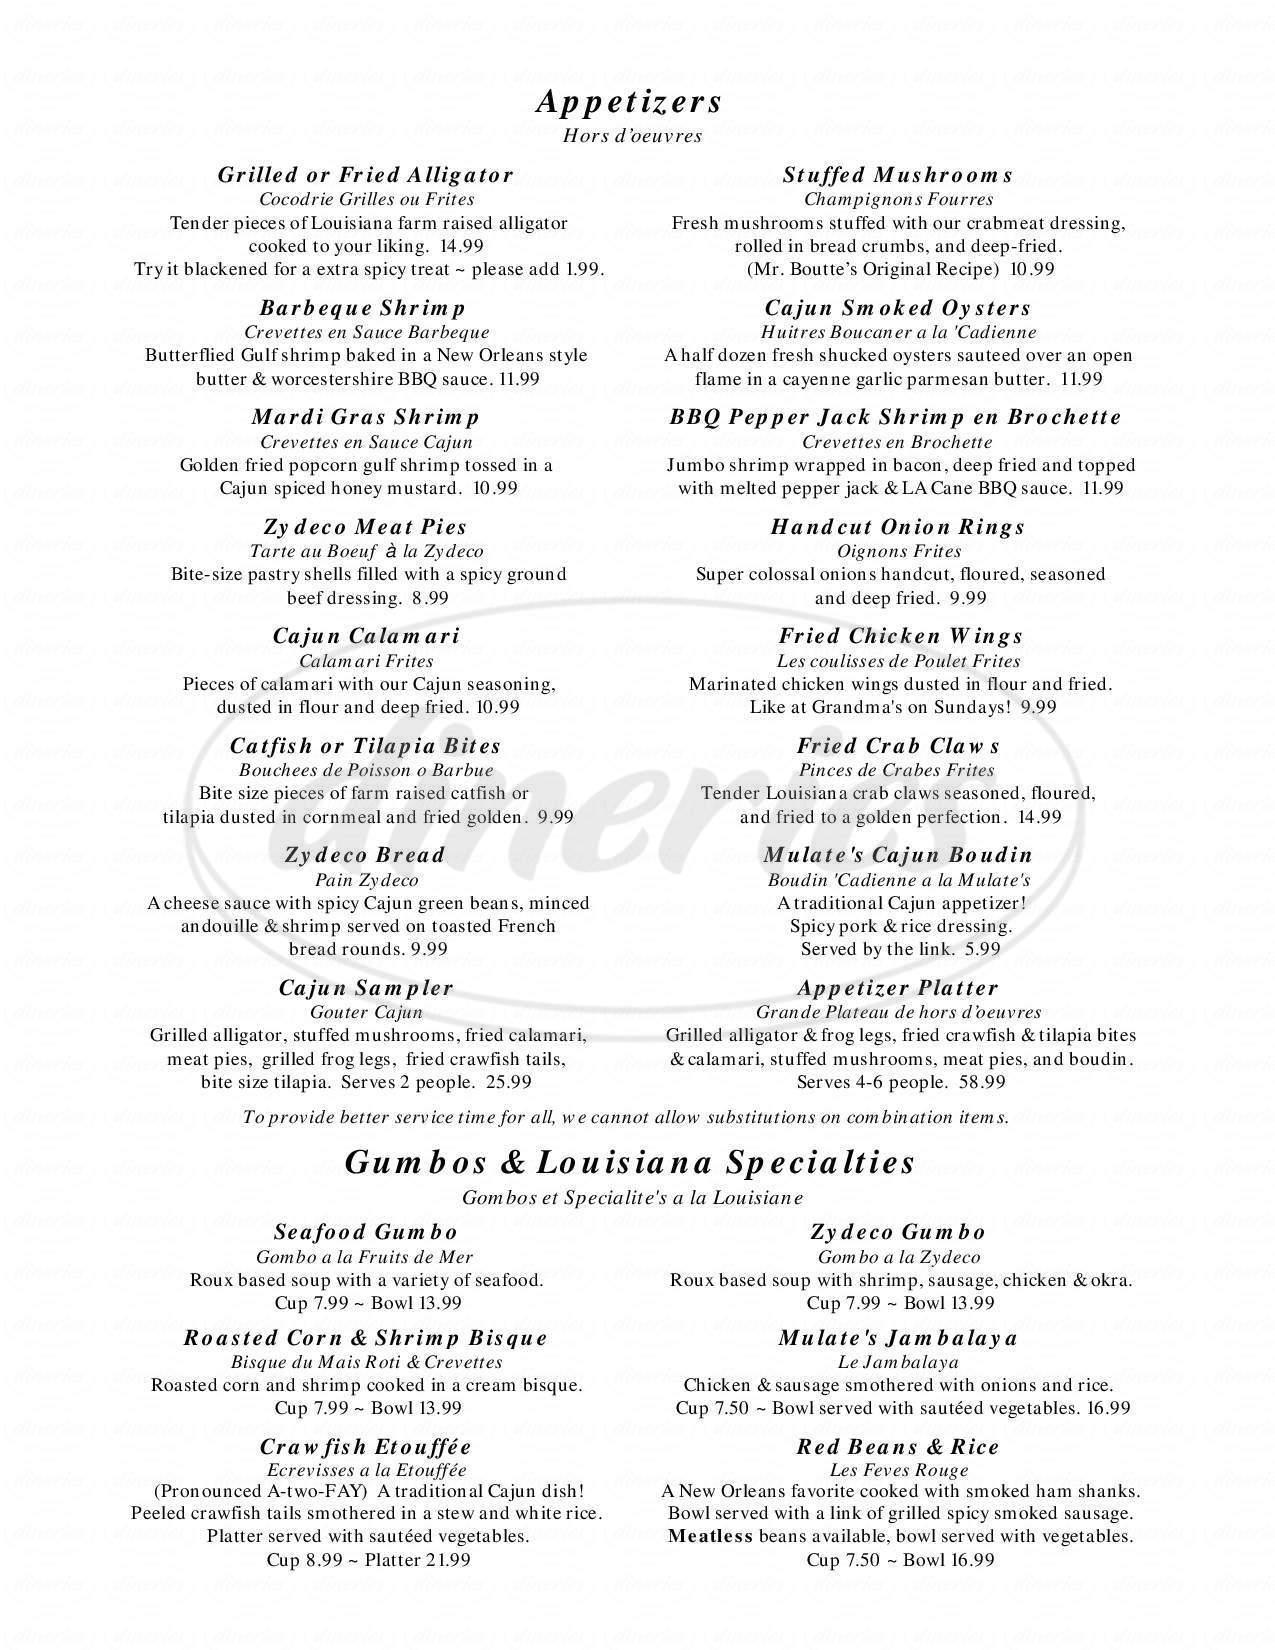 menu for Mulate's The Cajun Restaurant